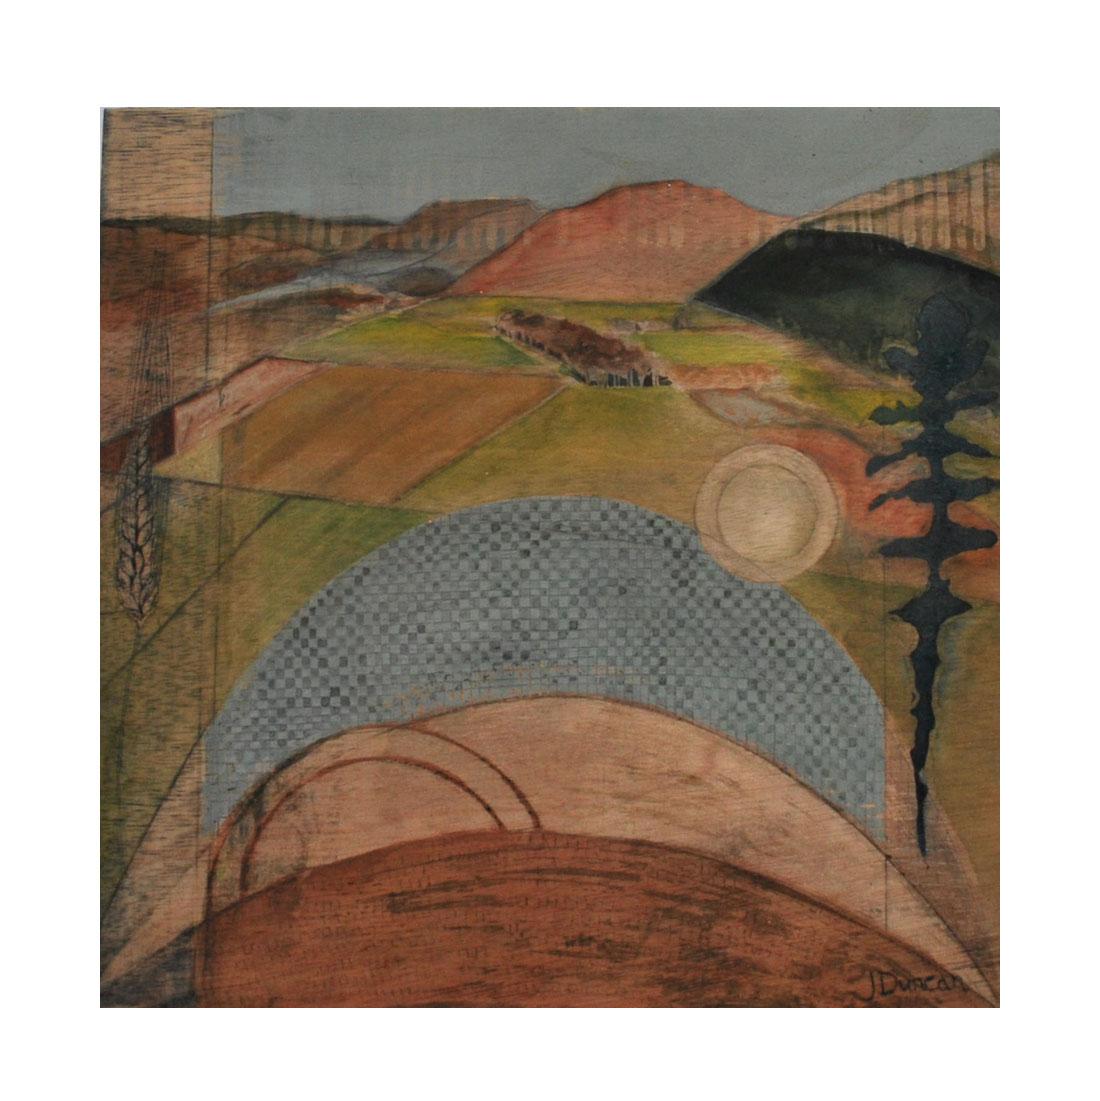 Image of Jean Duncan's painting 'Kilmartin' (Jean Duncan